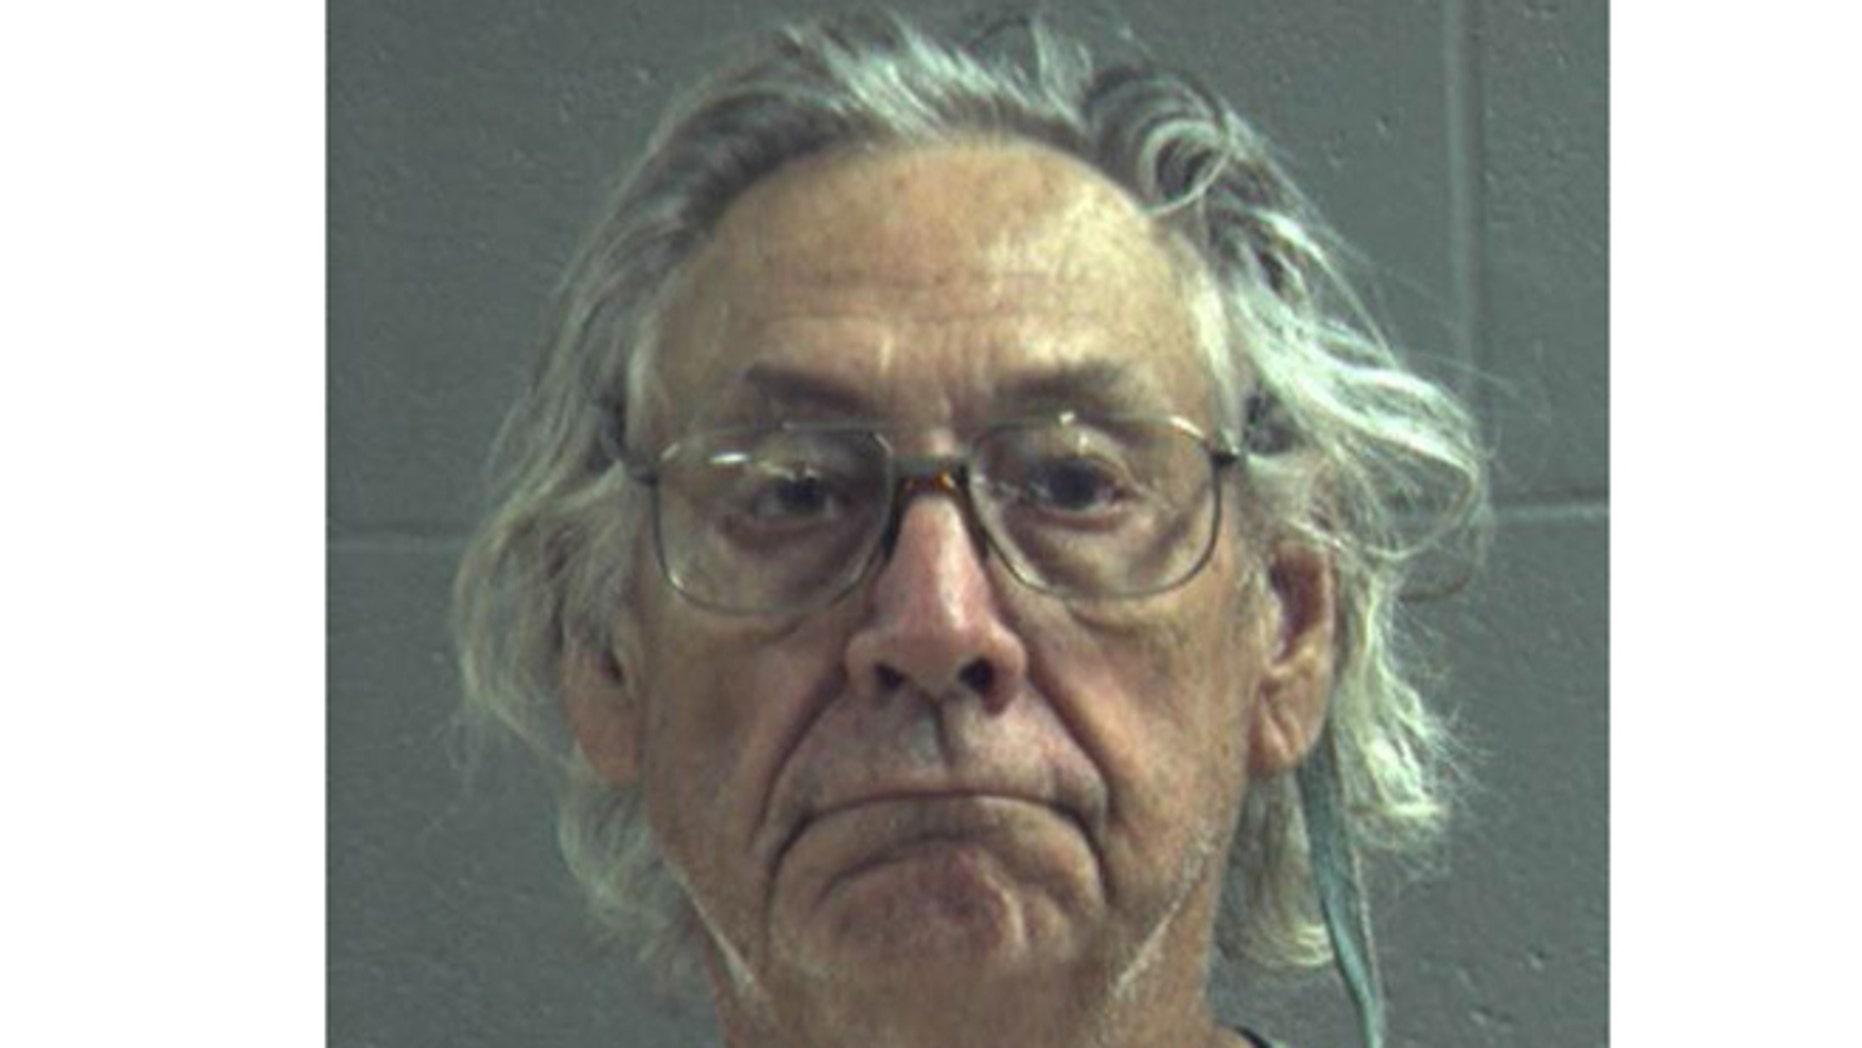 Mugshot for Allen Deaver, 74.